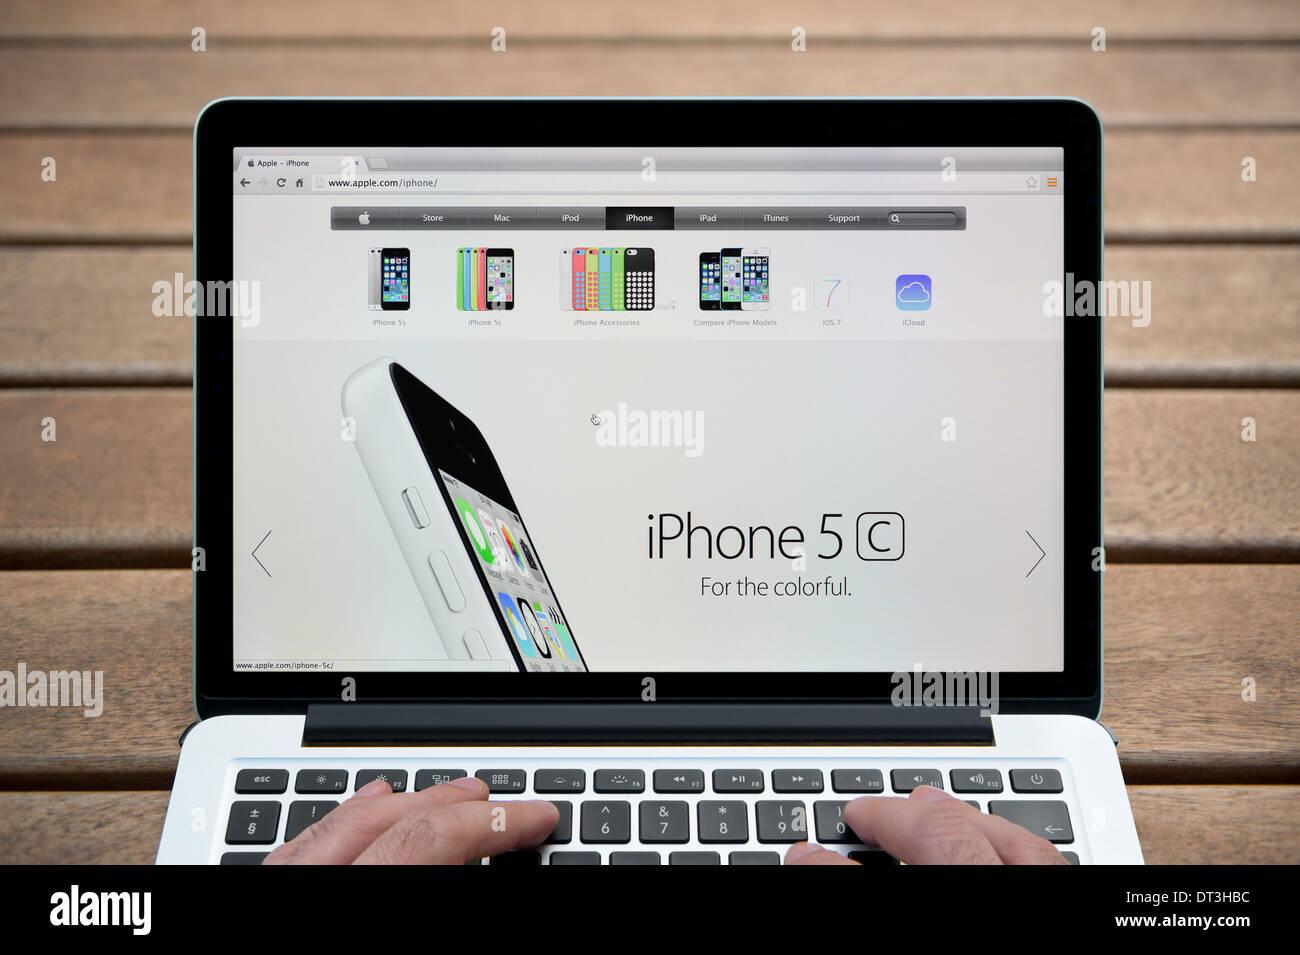 Apple Iphone Del Sito Web Su Un Macbook Contro Una Panca In Legno